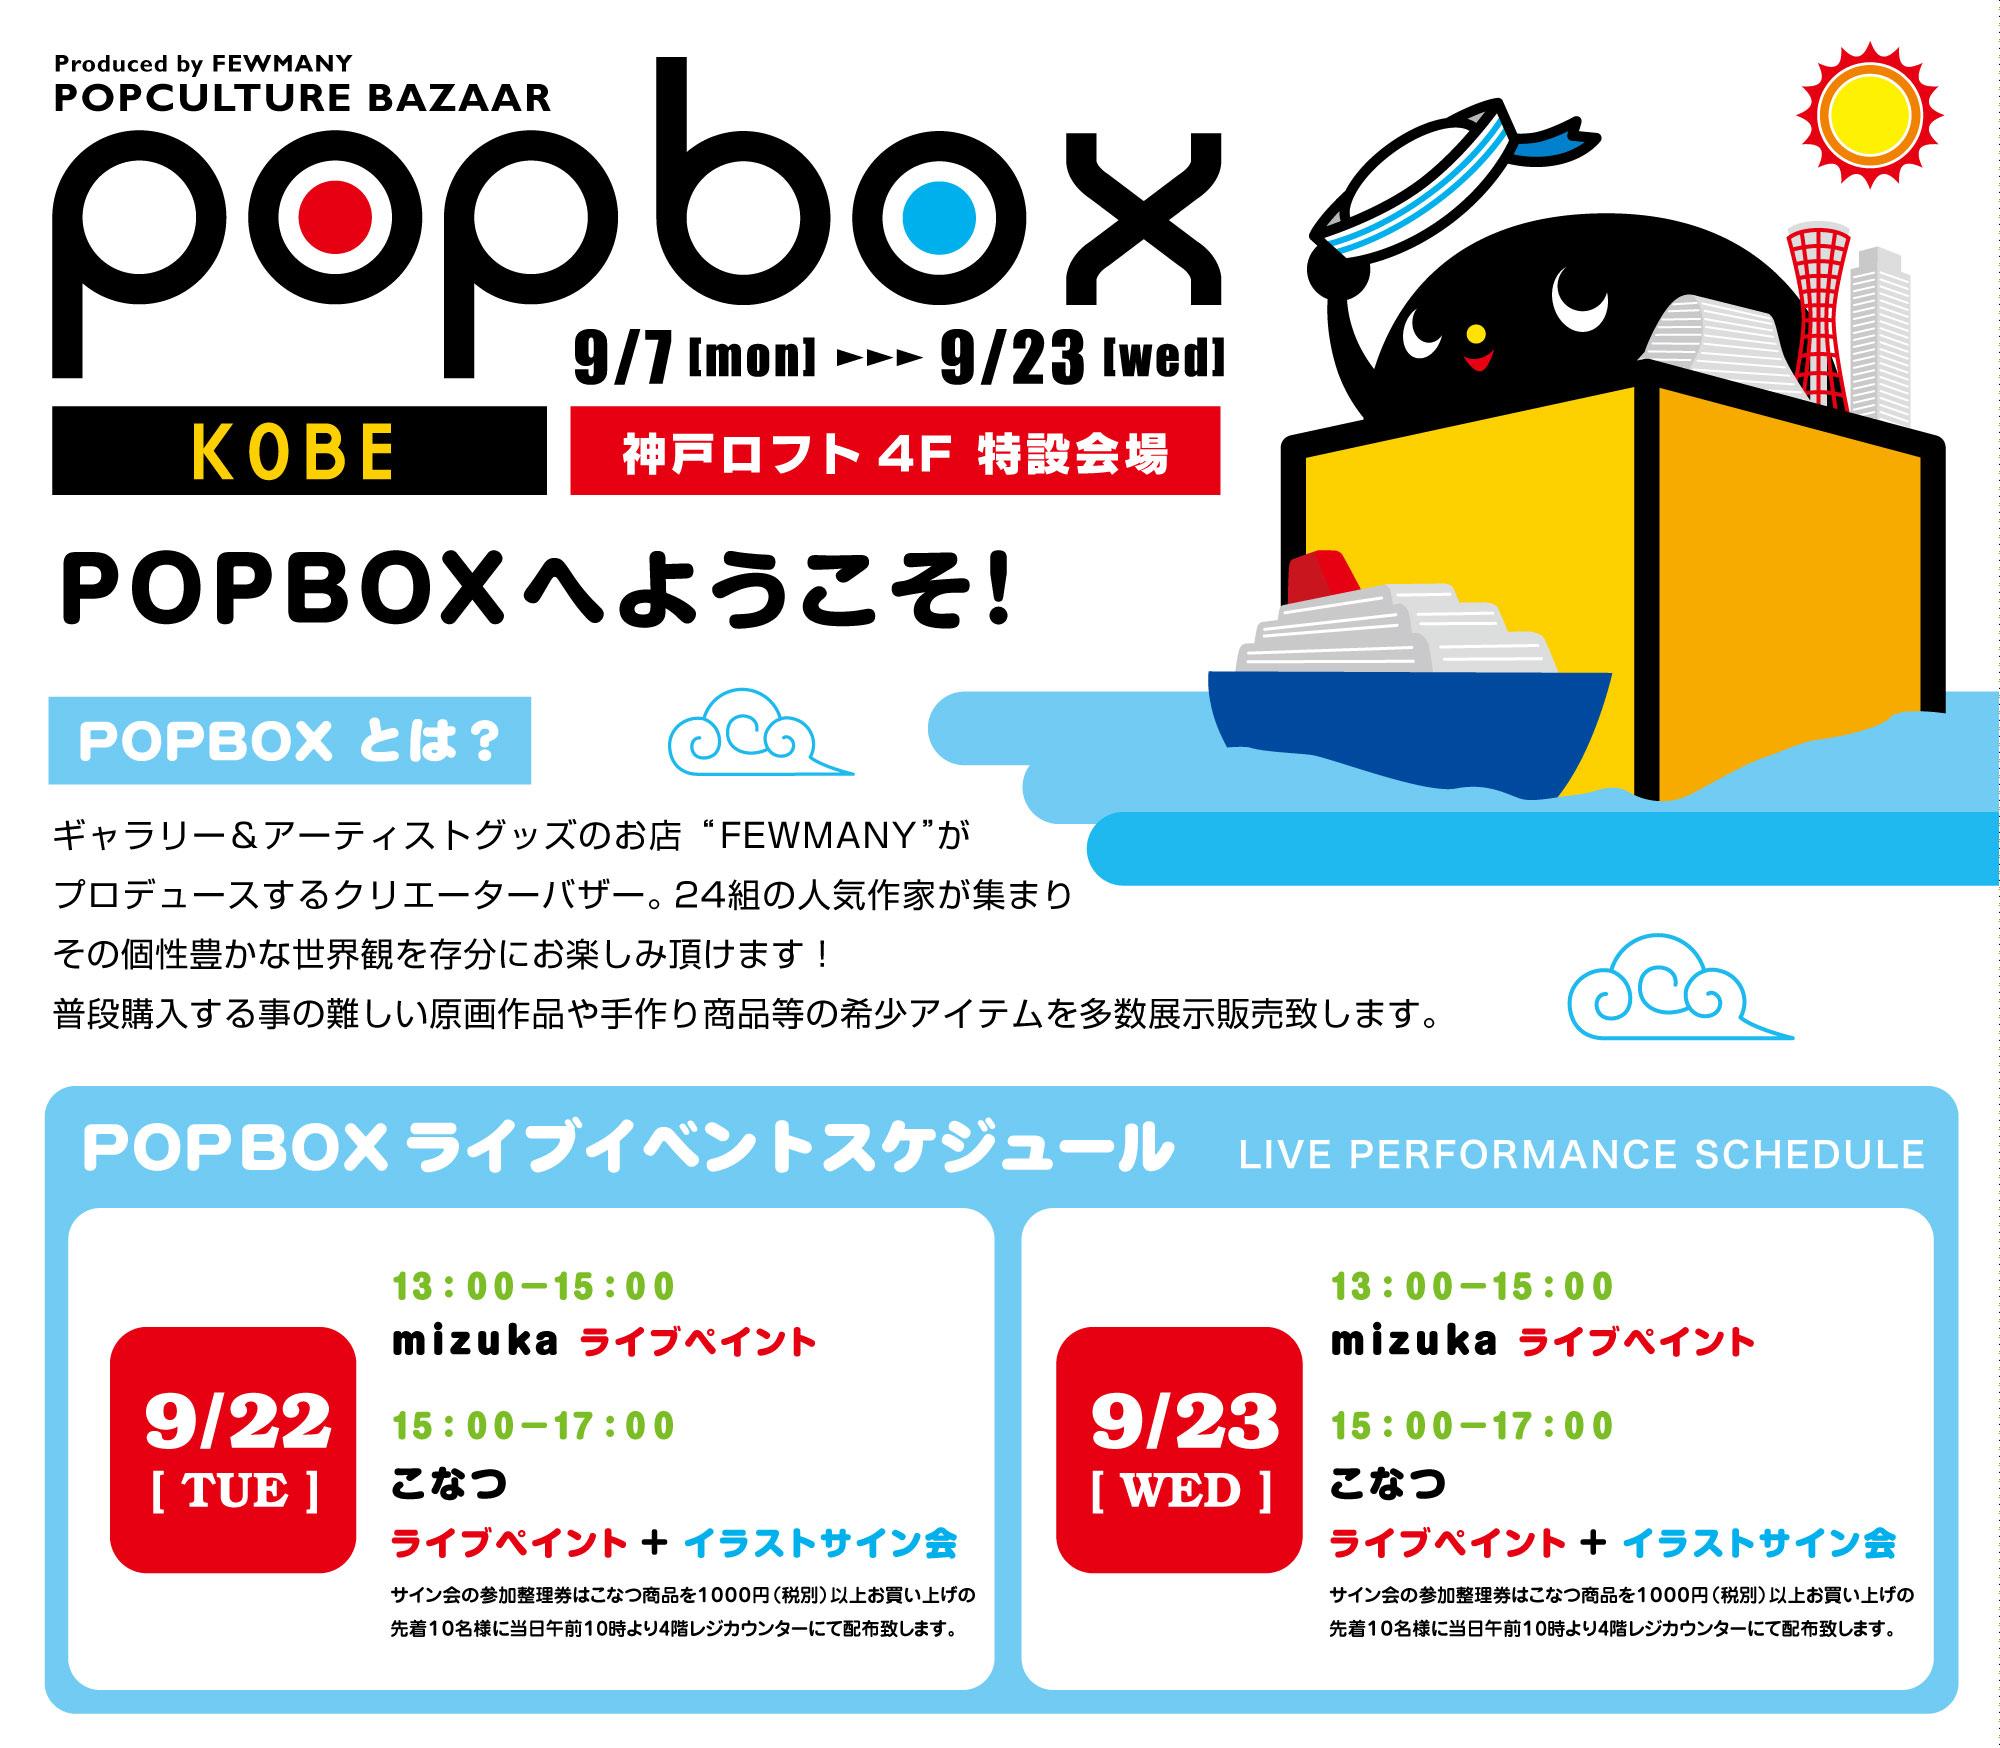 A4_POPbox_kobe_ura_3.jpg